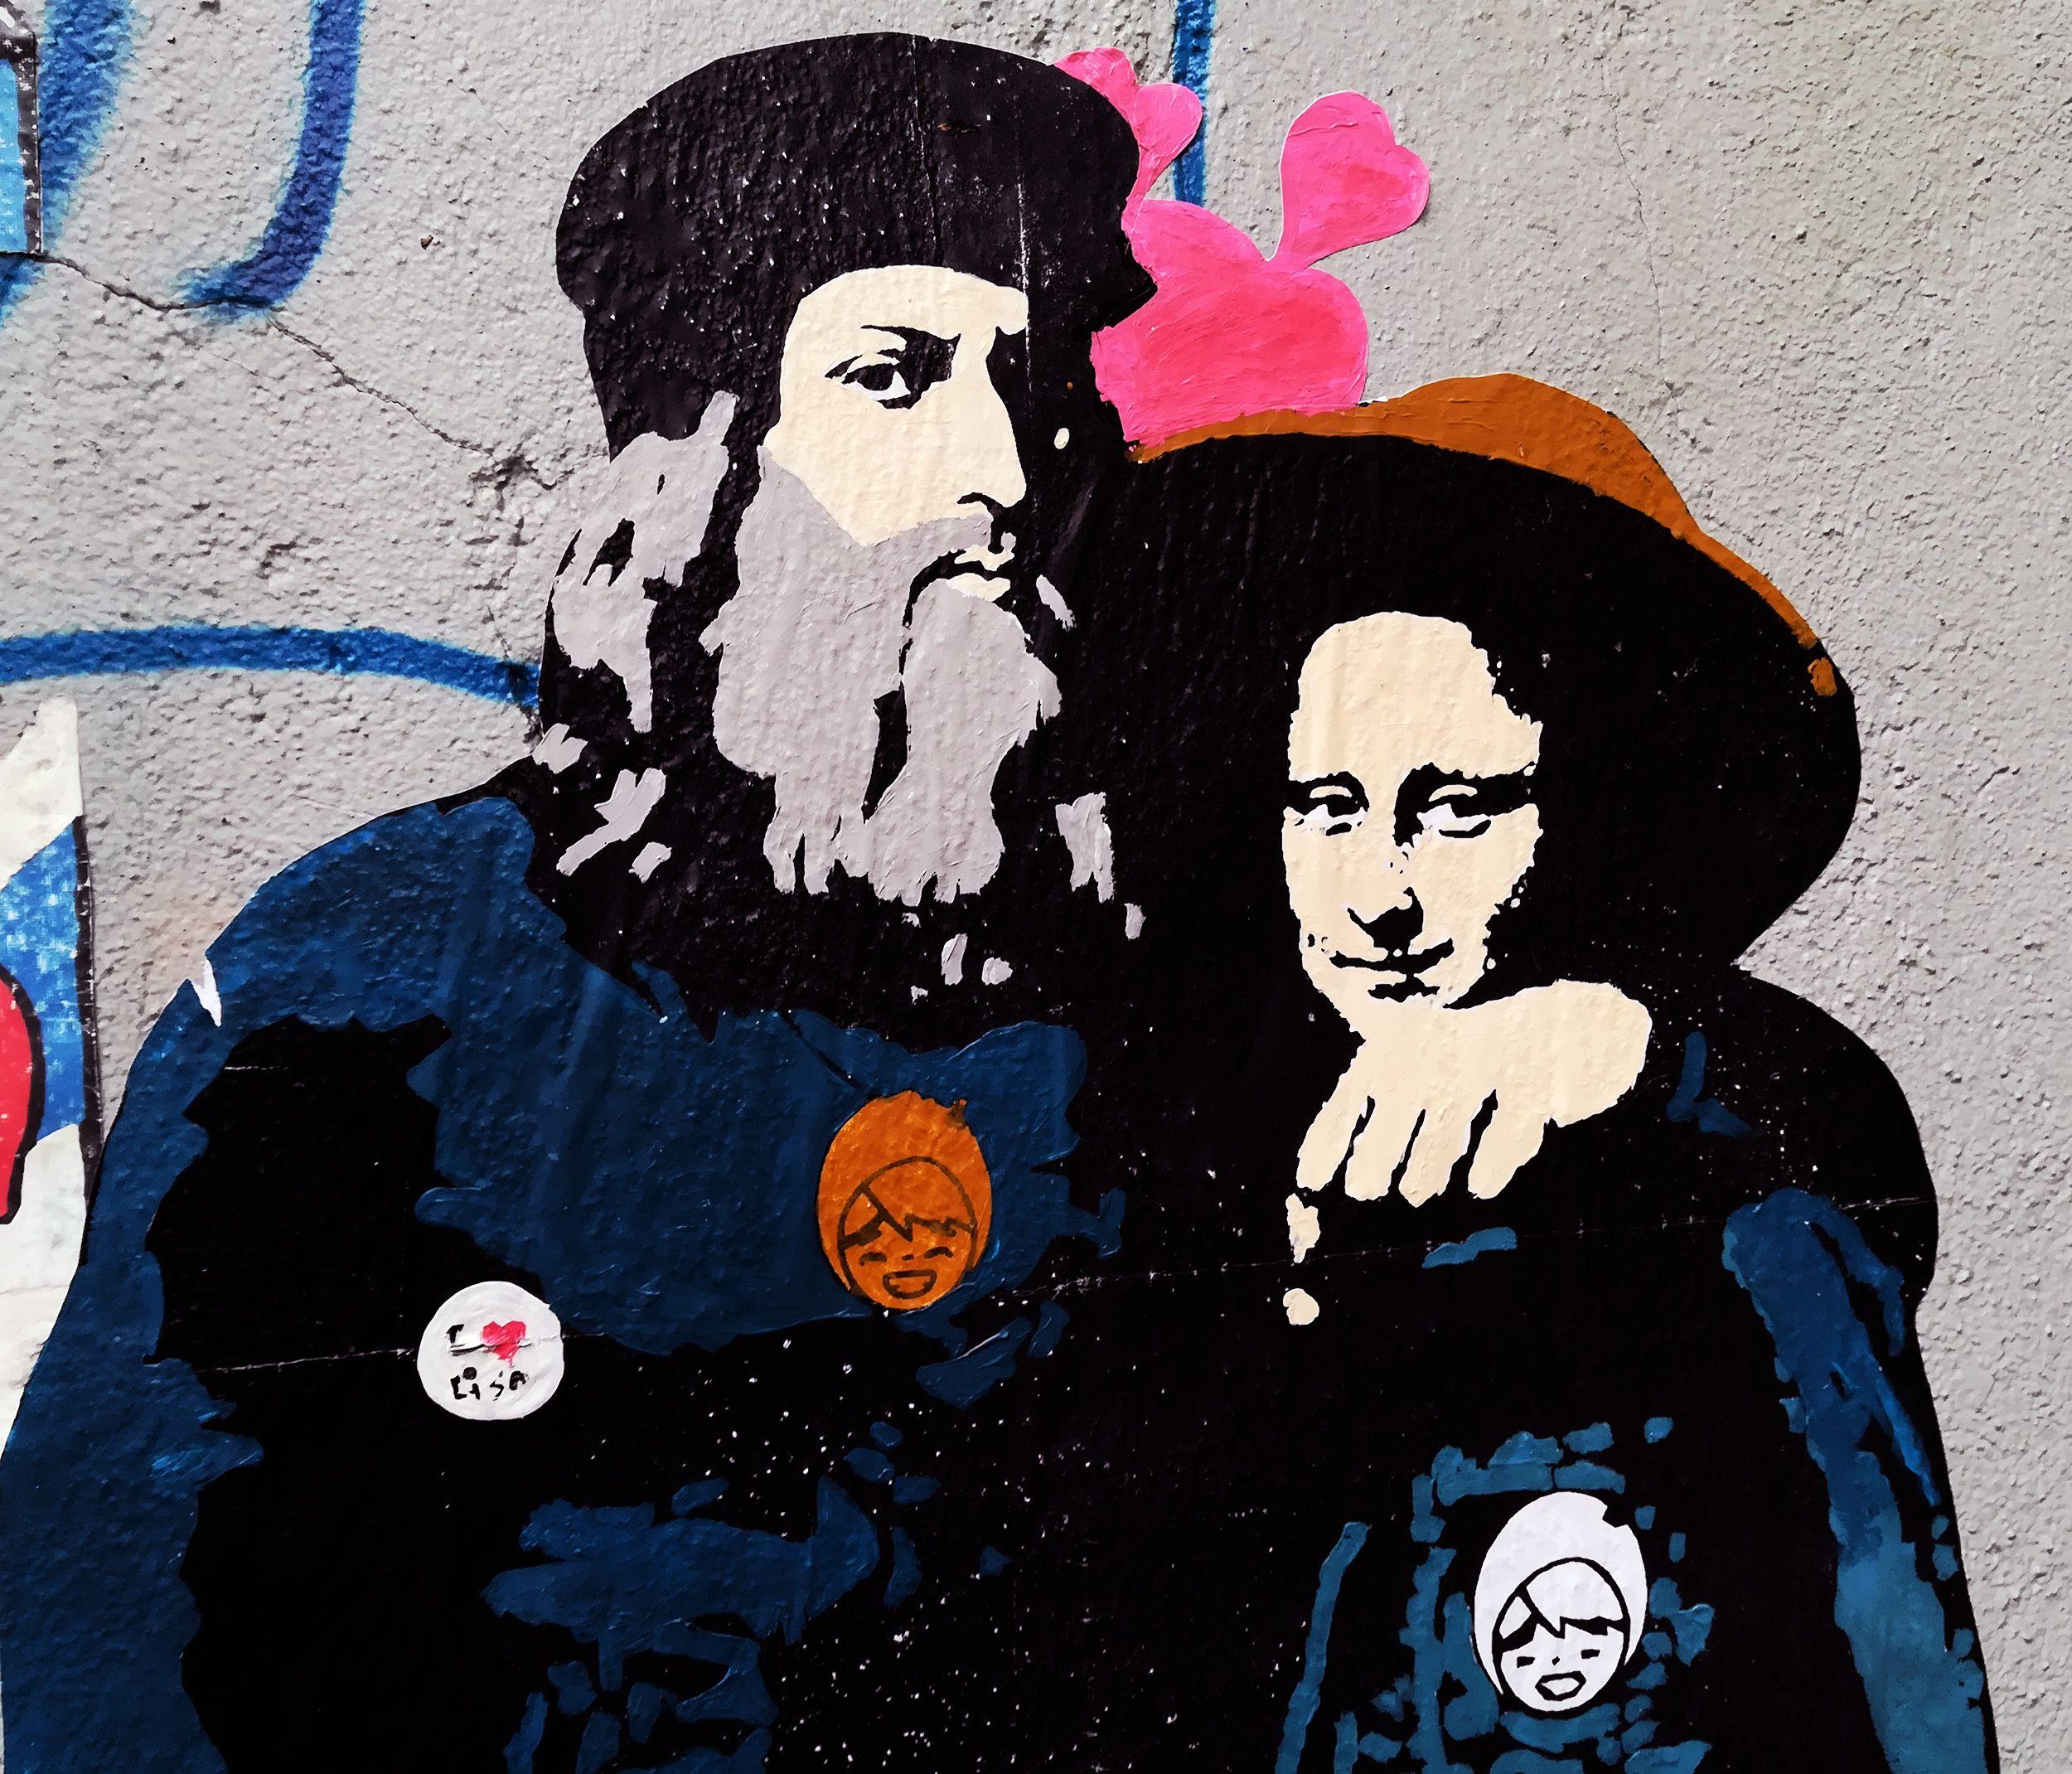 Leonardo da vinci e monna lisa visti da tv boy sticker in milano italy picture by giacomo zavatteri streetart stickers graffiti tvboy milano